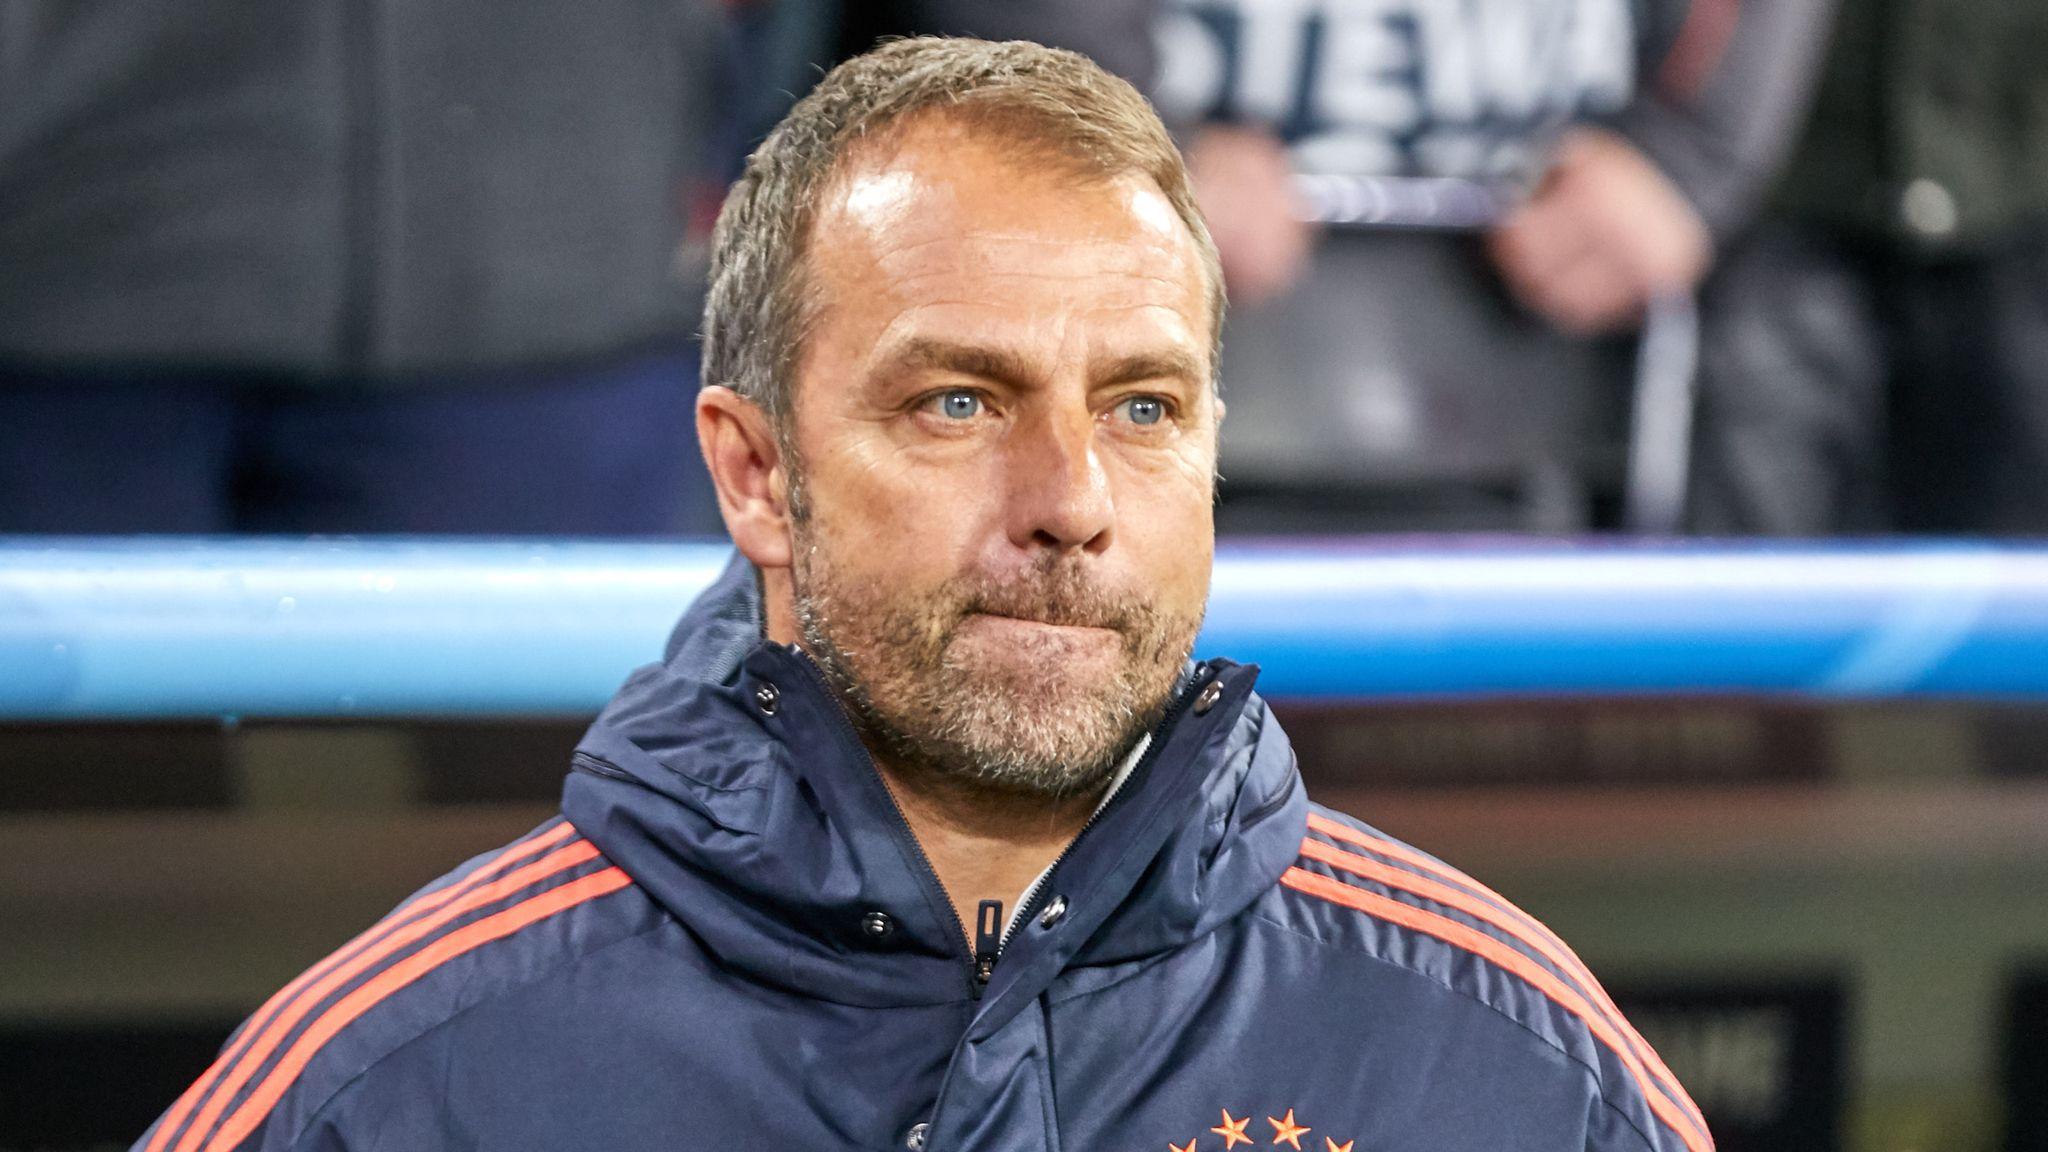 Mauricio Pochettino: Bayern Munich considering former Tottenham Hotspur boss